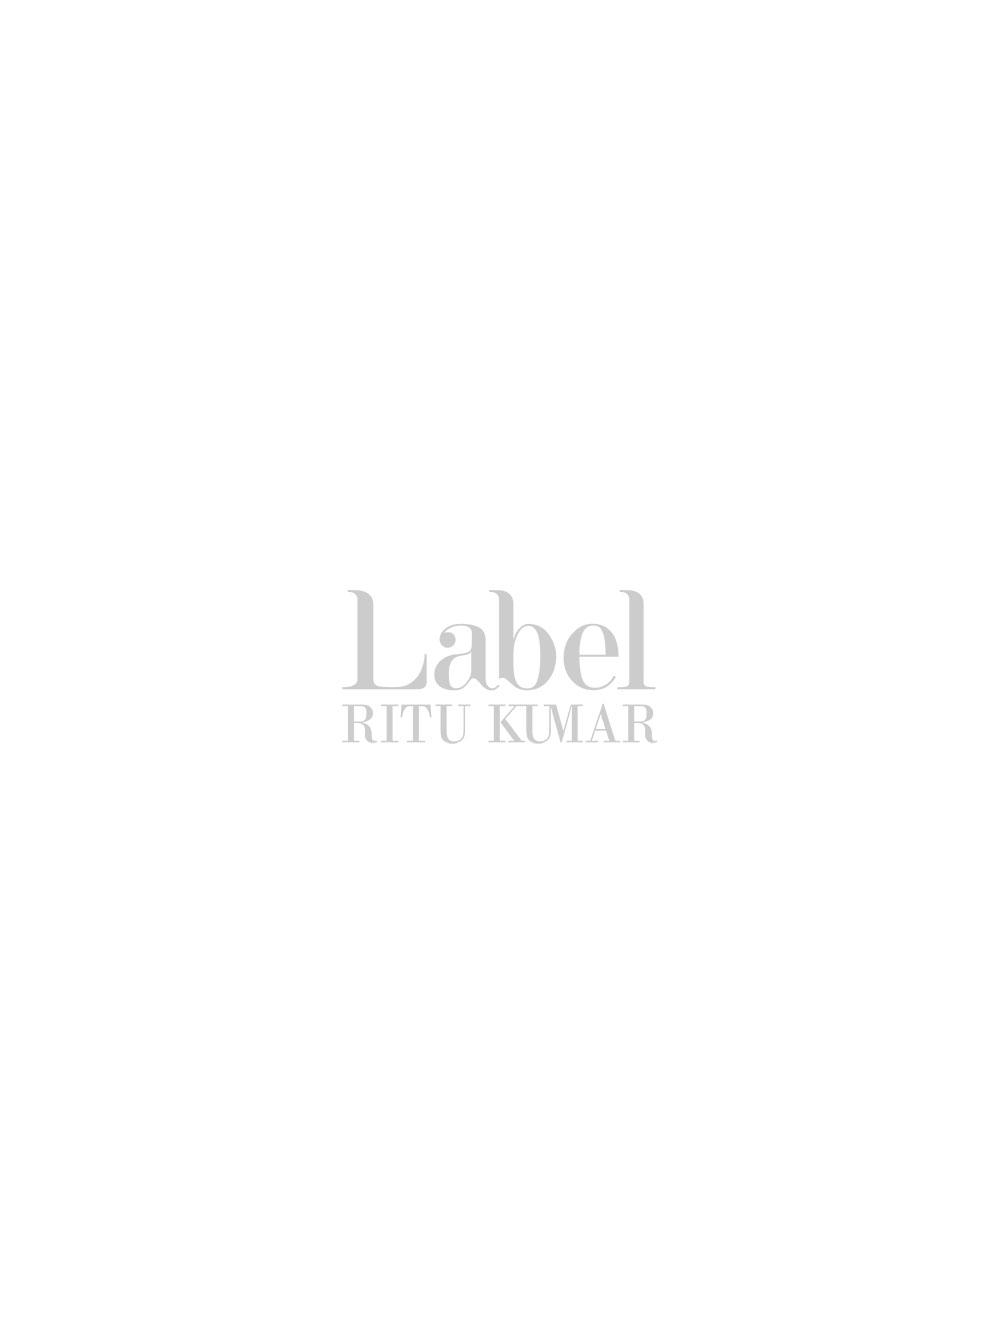 Kalki Koechlin's Grey Floral Short Dress